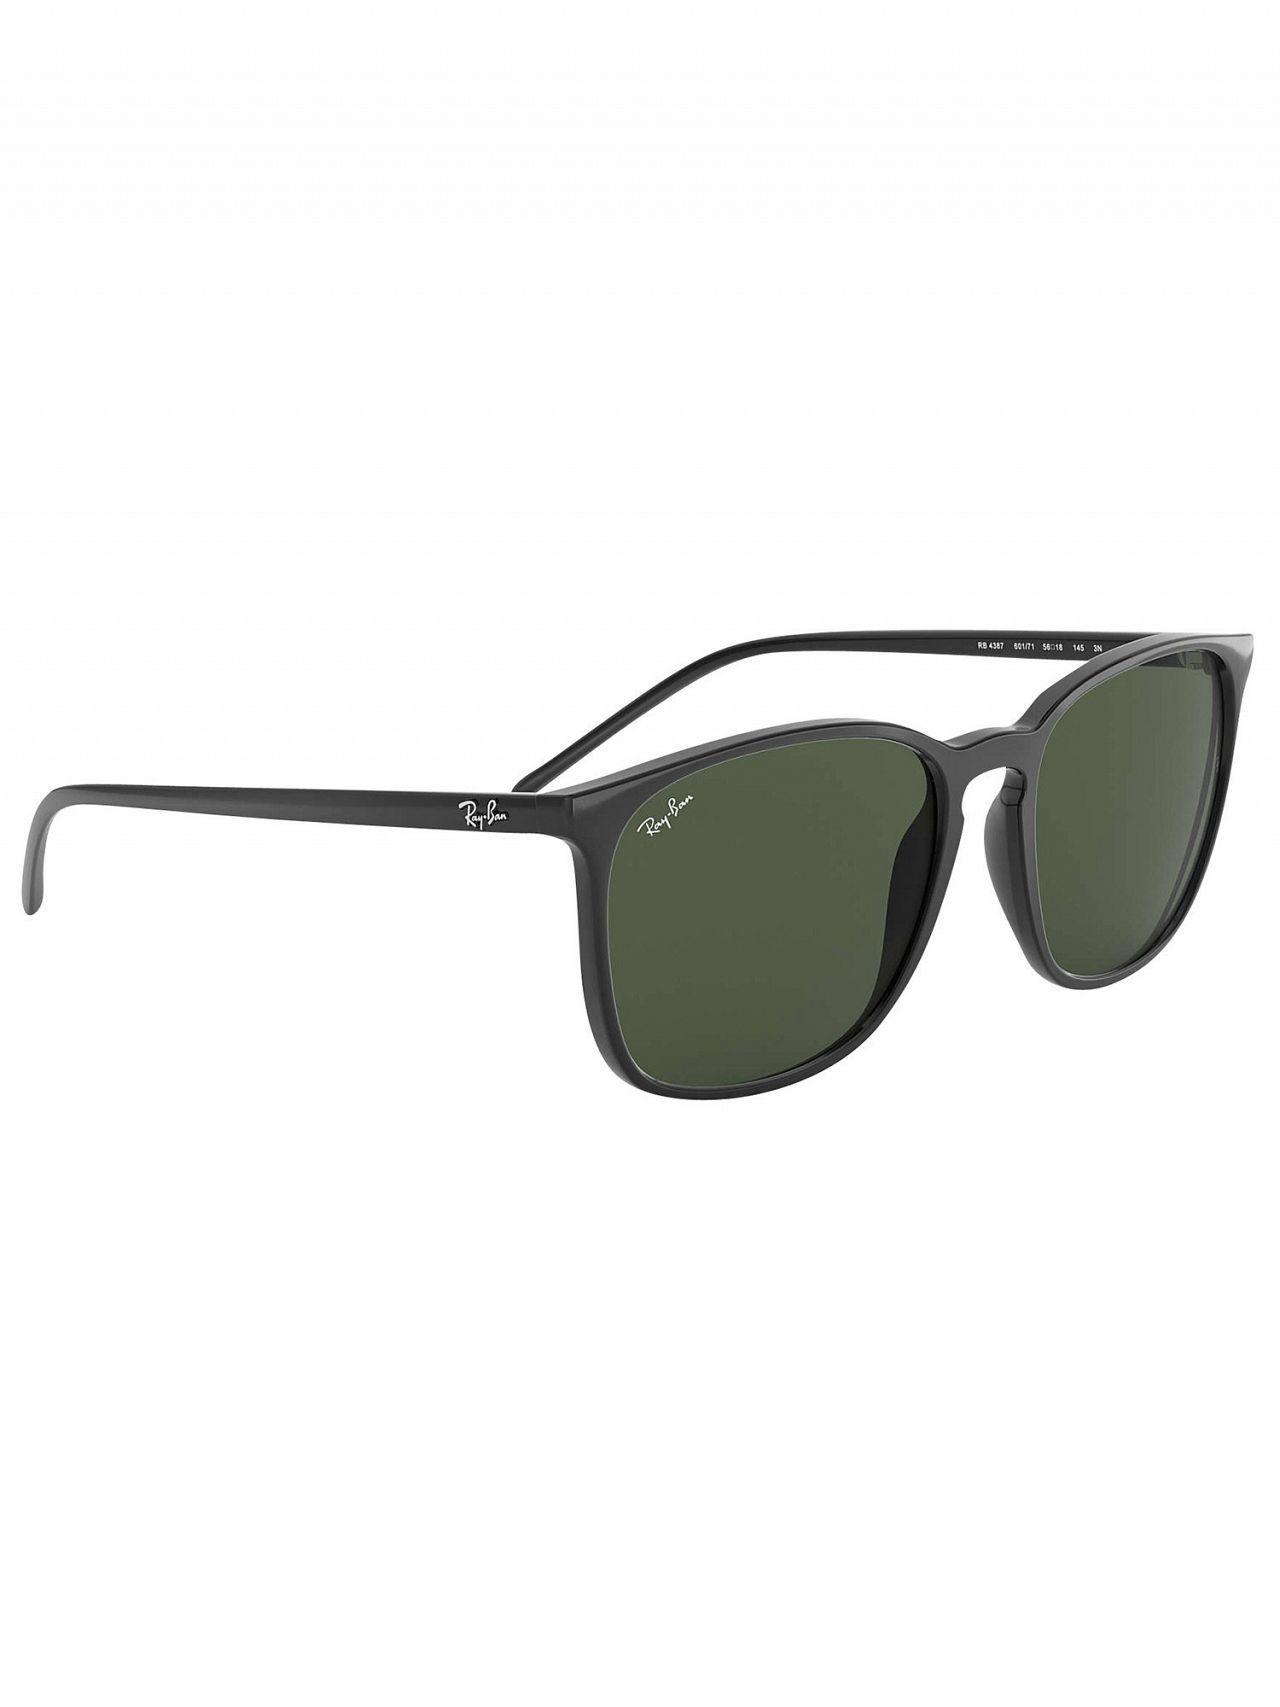 712c670d1b Ray-Ban - Black Rb4387 Square Sunglasses for Men - Lyst. View fullscreen